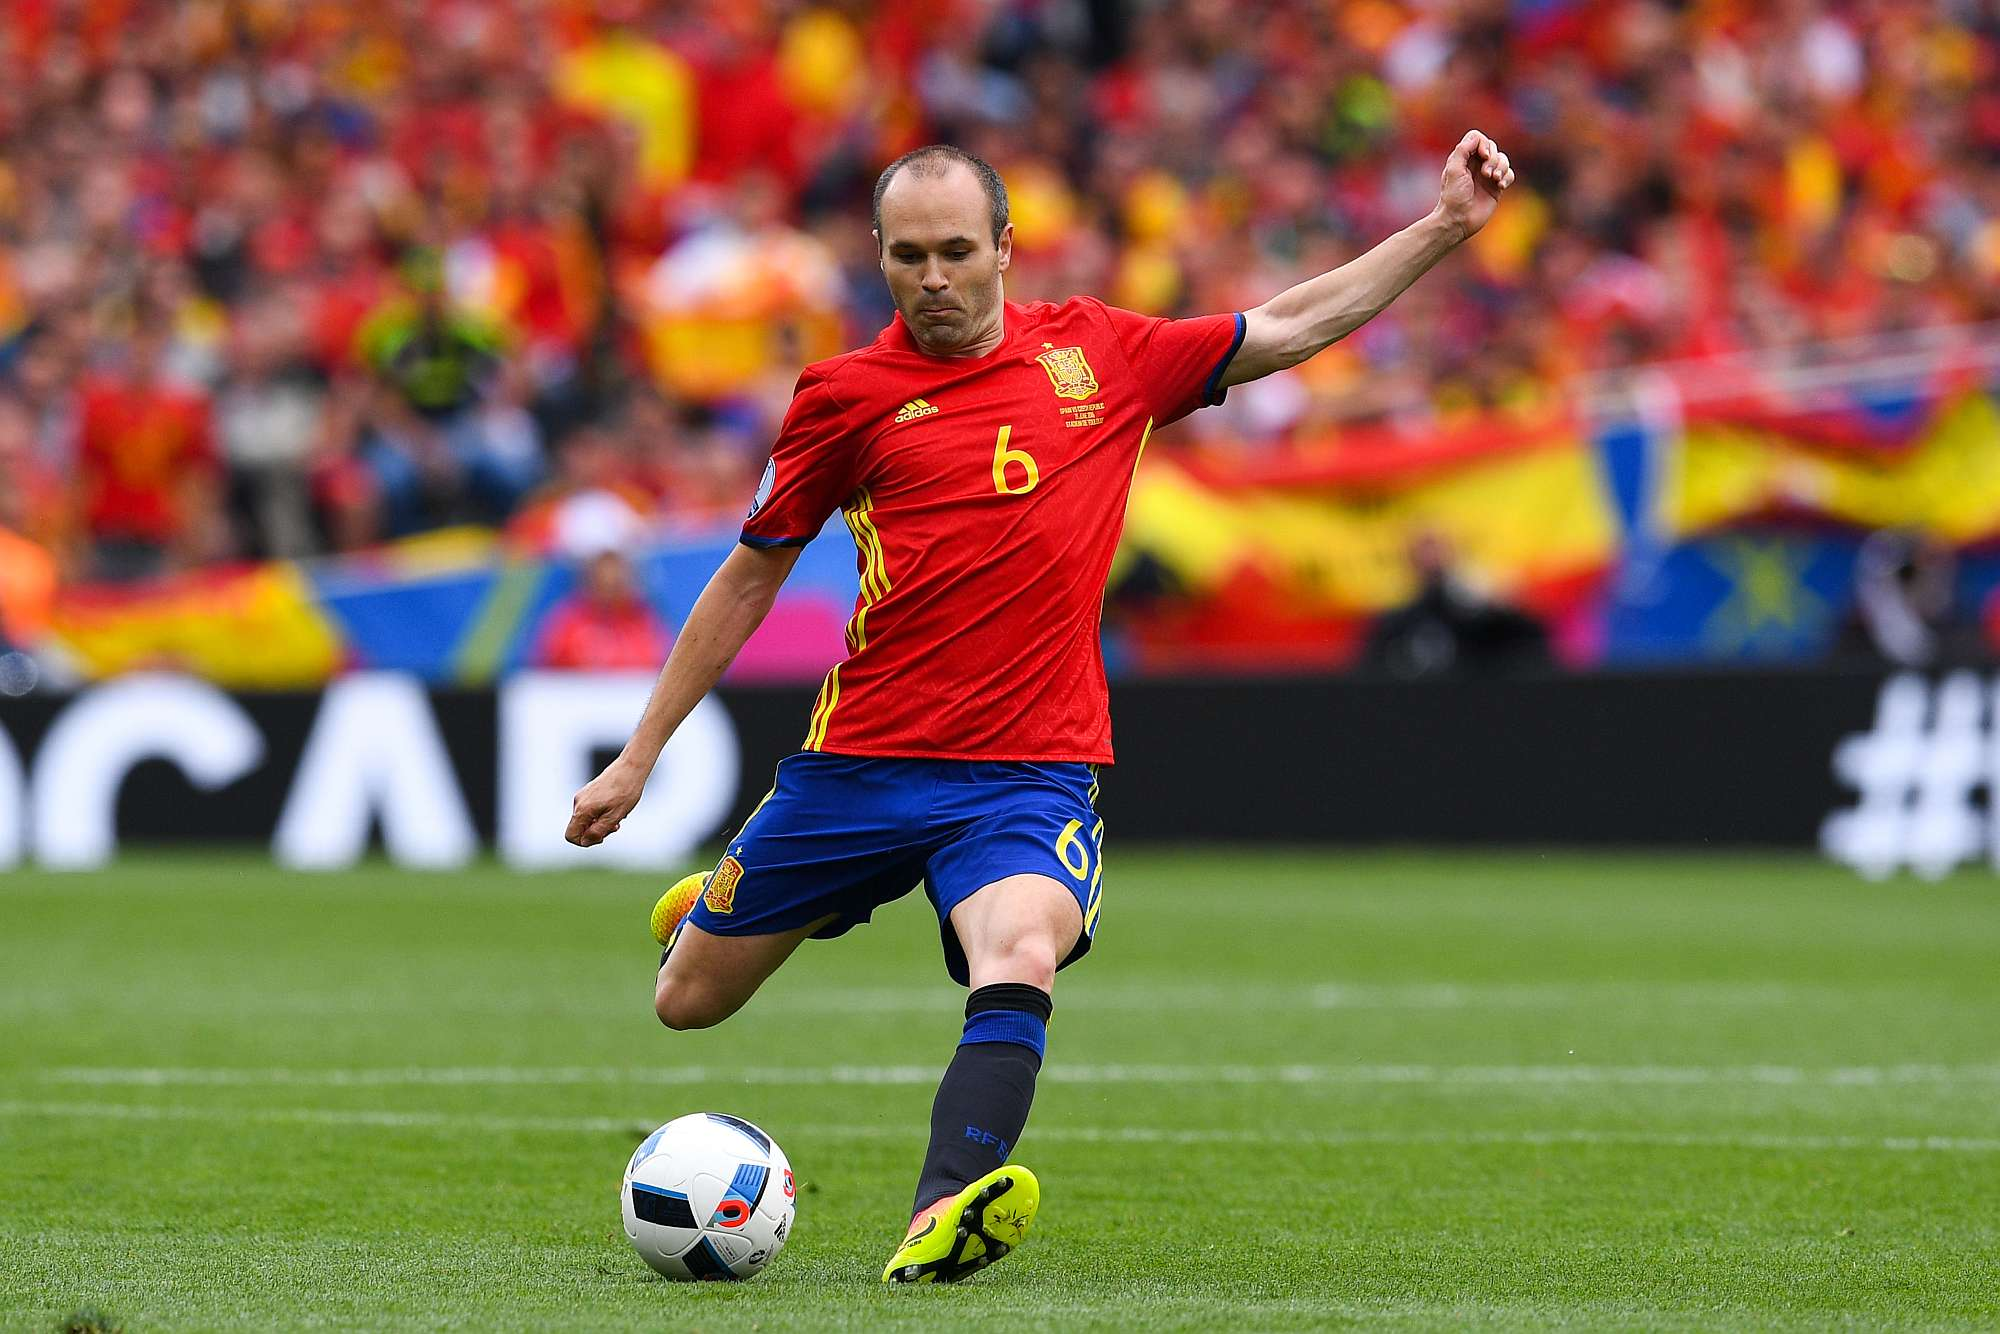 Euro 2016, anteprima Spagna-Turchia: news, pronostici e quote